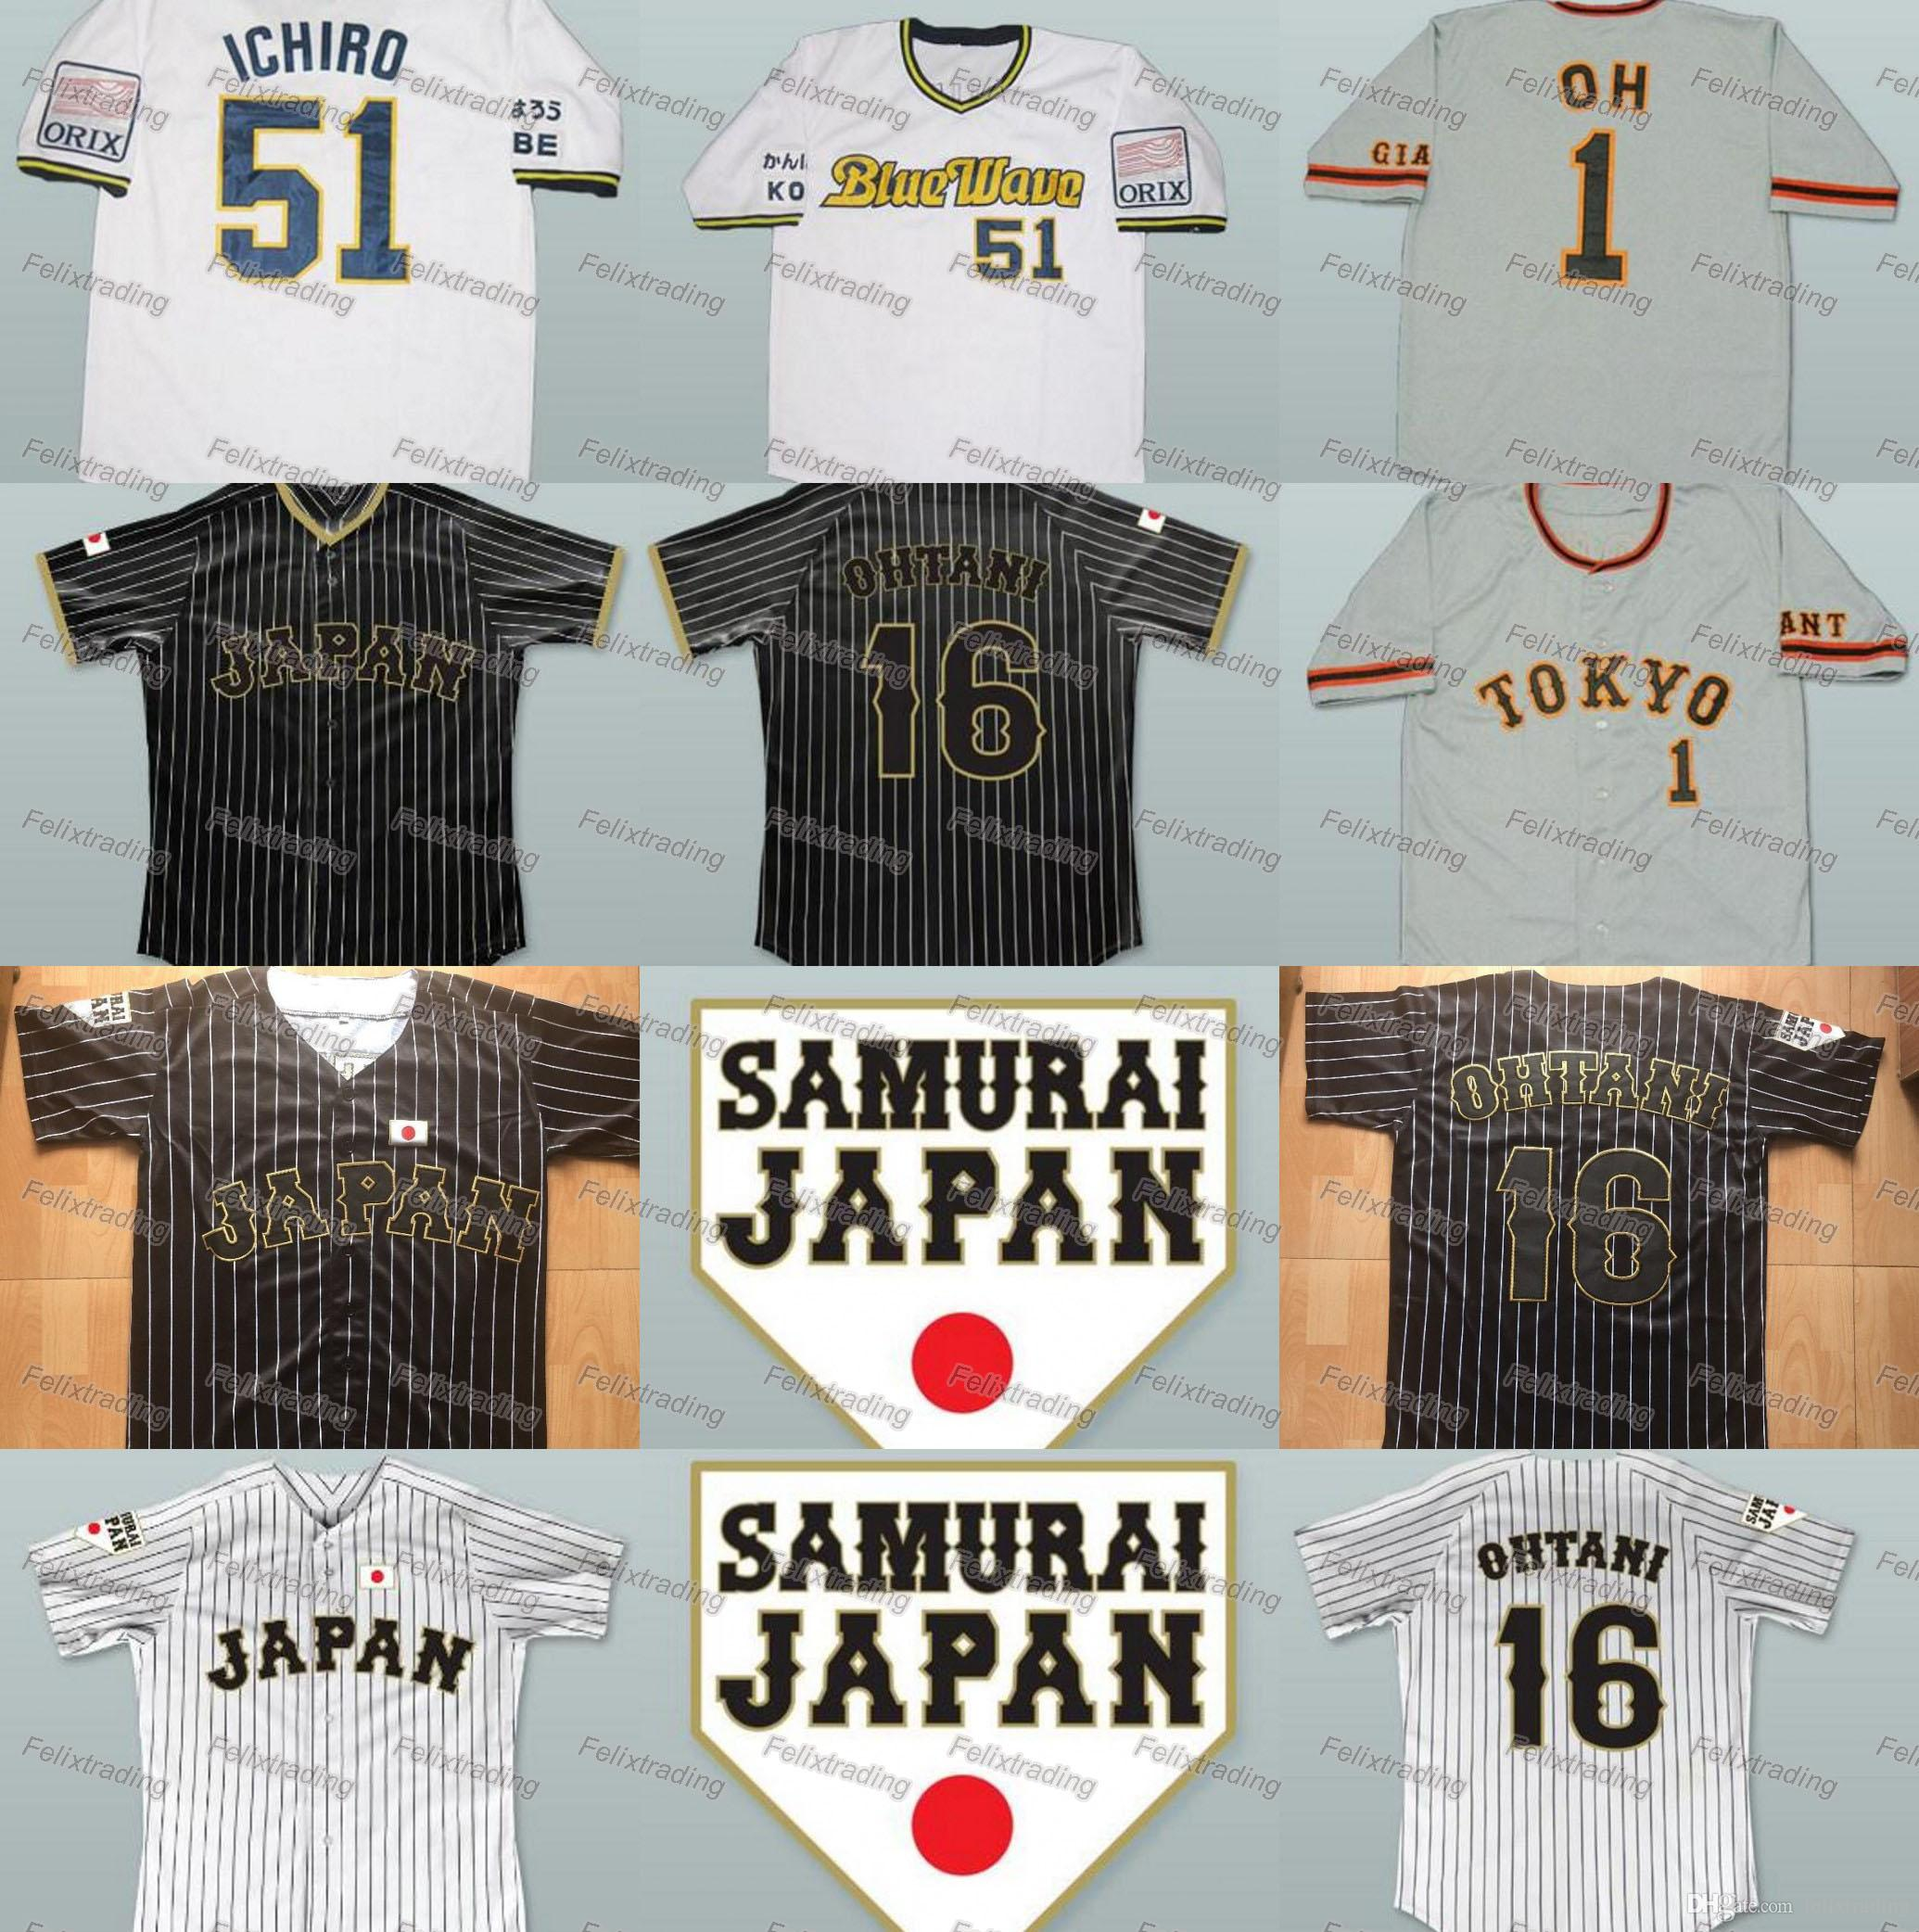 Shohei Ohtani 16 Japan Samurai Baseball Jersey 1 Sadaharu Oh 51 Ichiro  Suzuki Men Women Youth All Stitched Baseball Jerseys Canada 2018 From  Felixtrading aaf4427f81